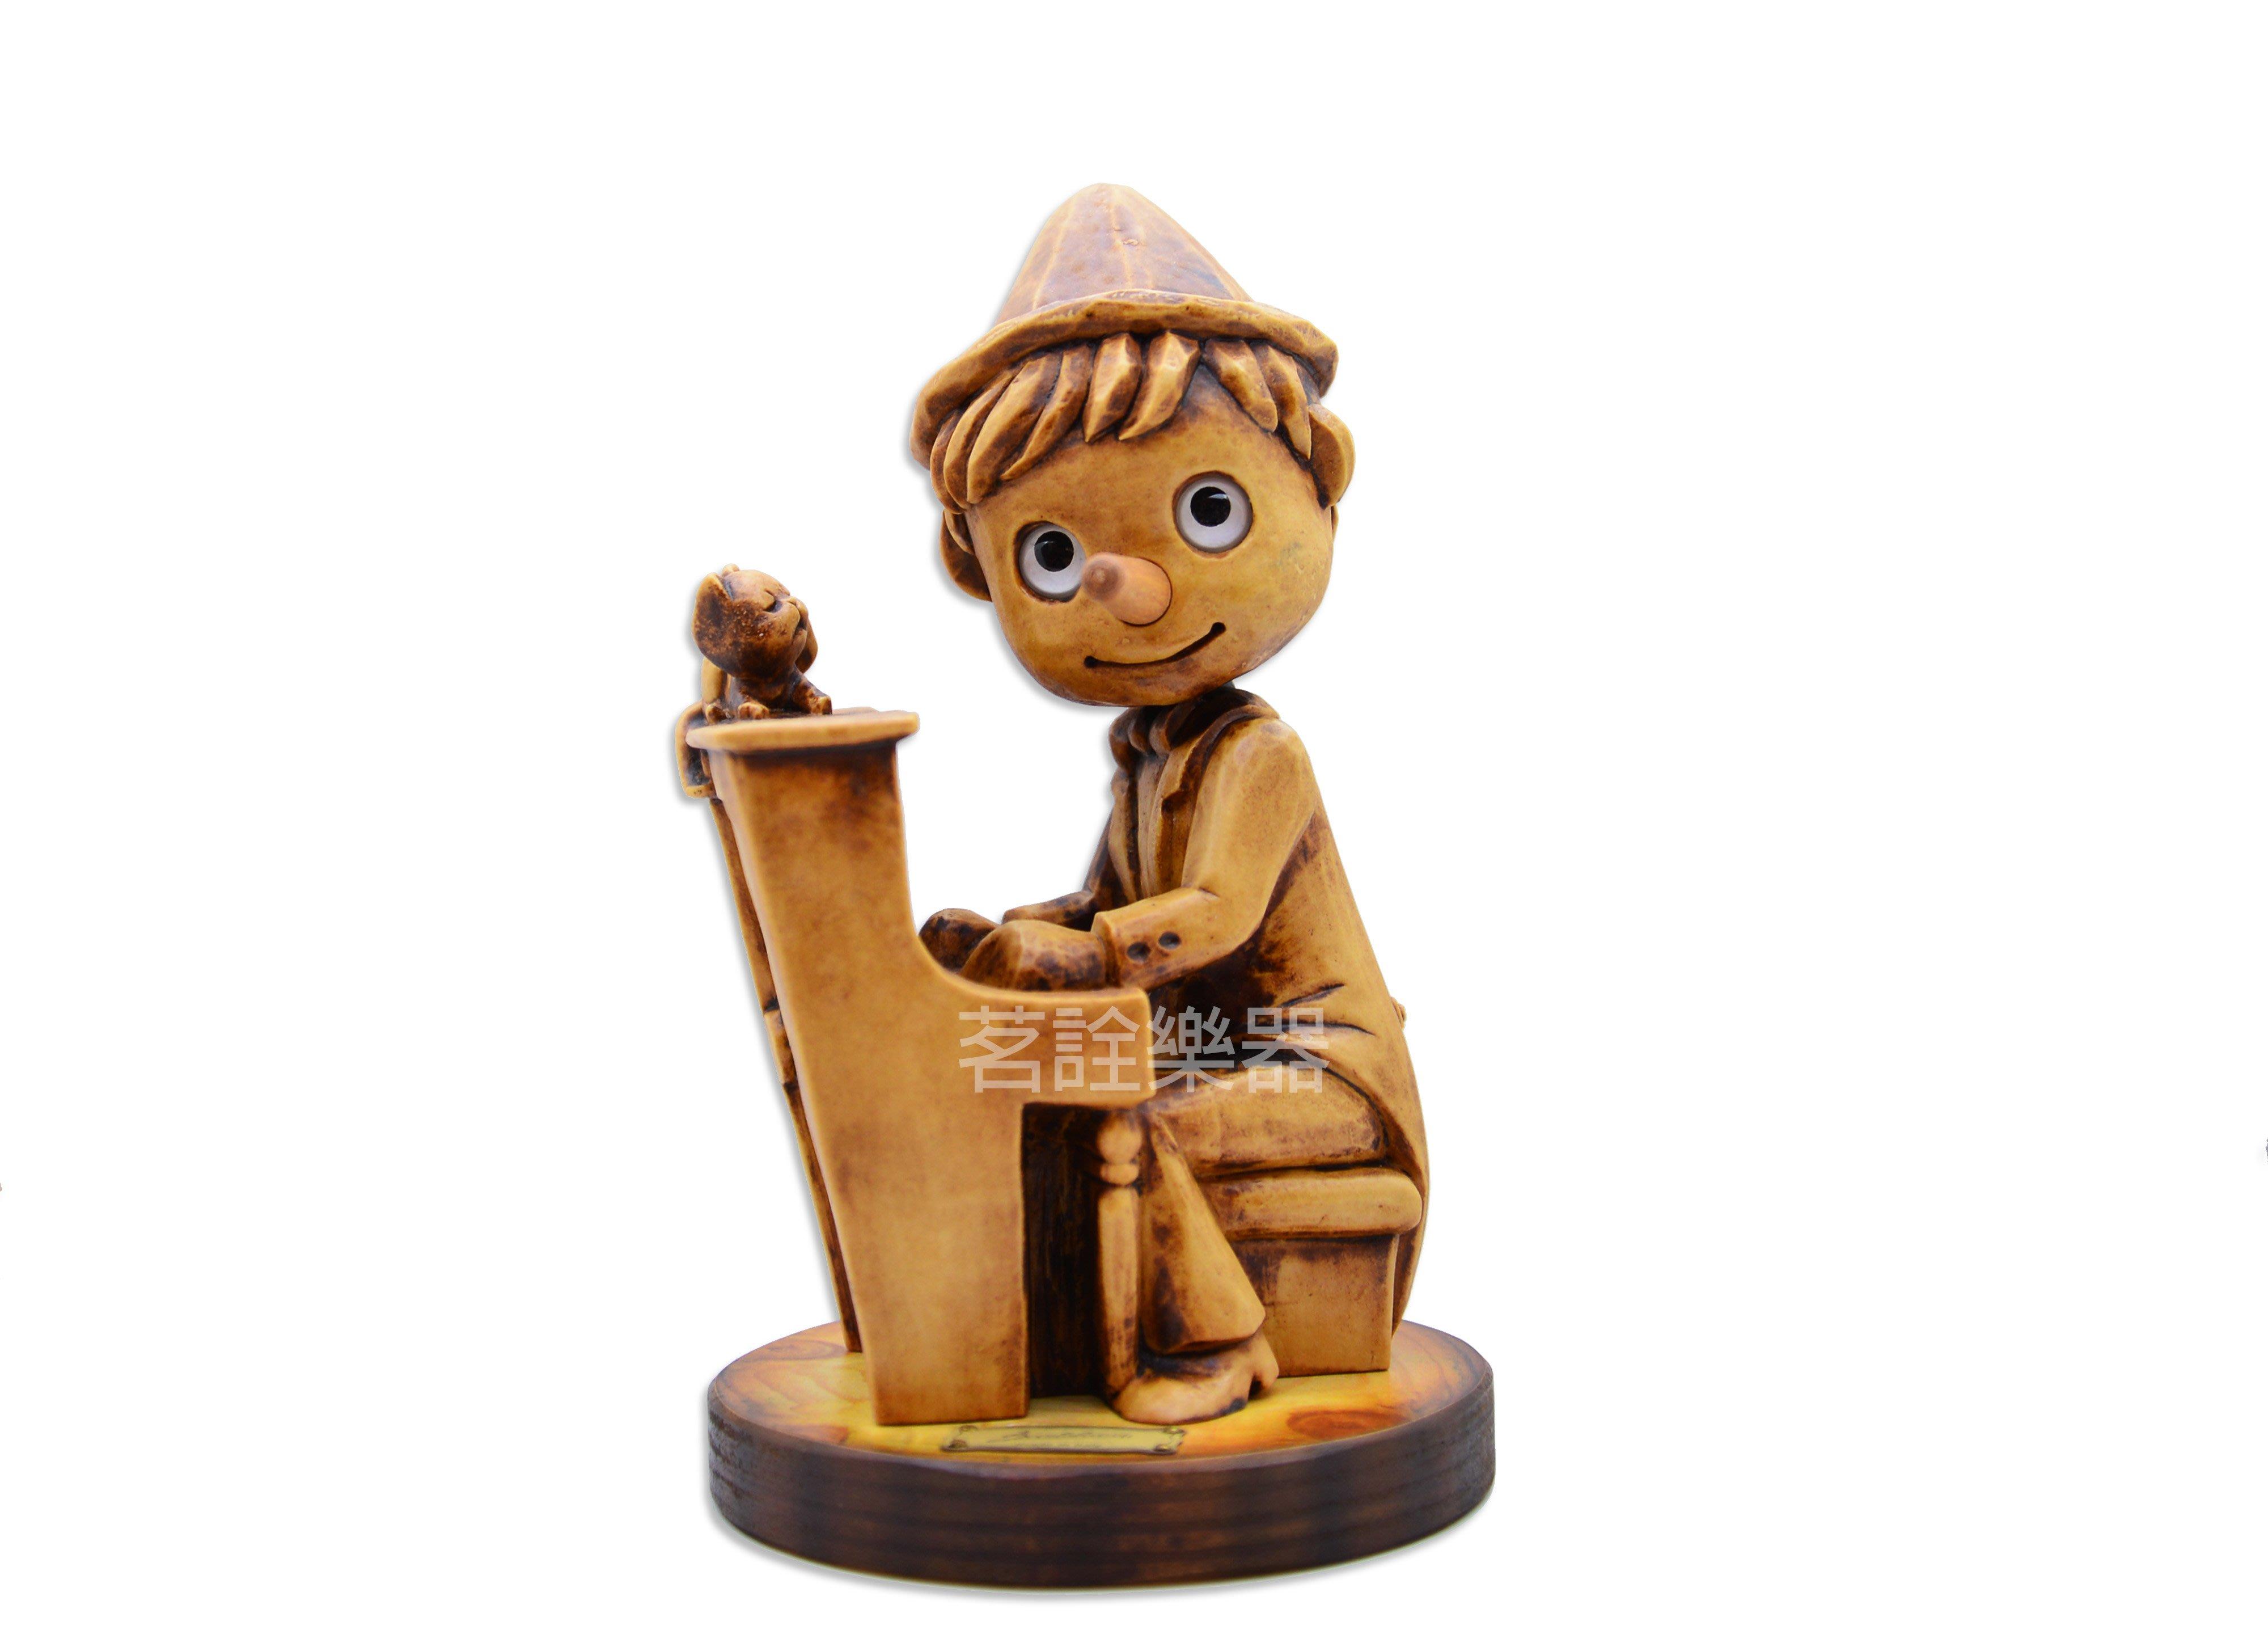 Musician Designer 皮諾丘 小木偶 木製 鋼琴 彈奏 木雕 禮品 送禮 義大利製 【茗詮樂器】